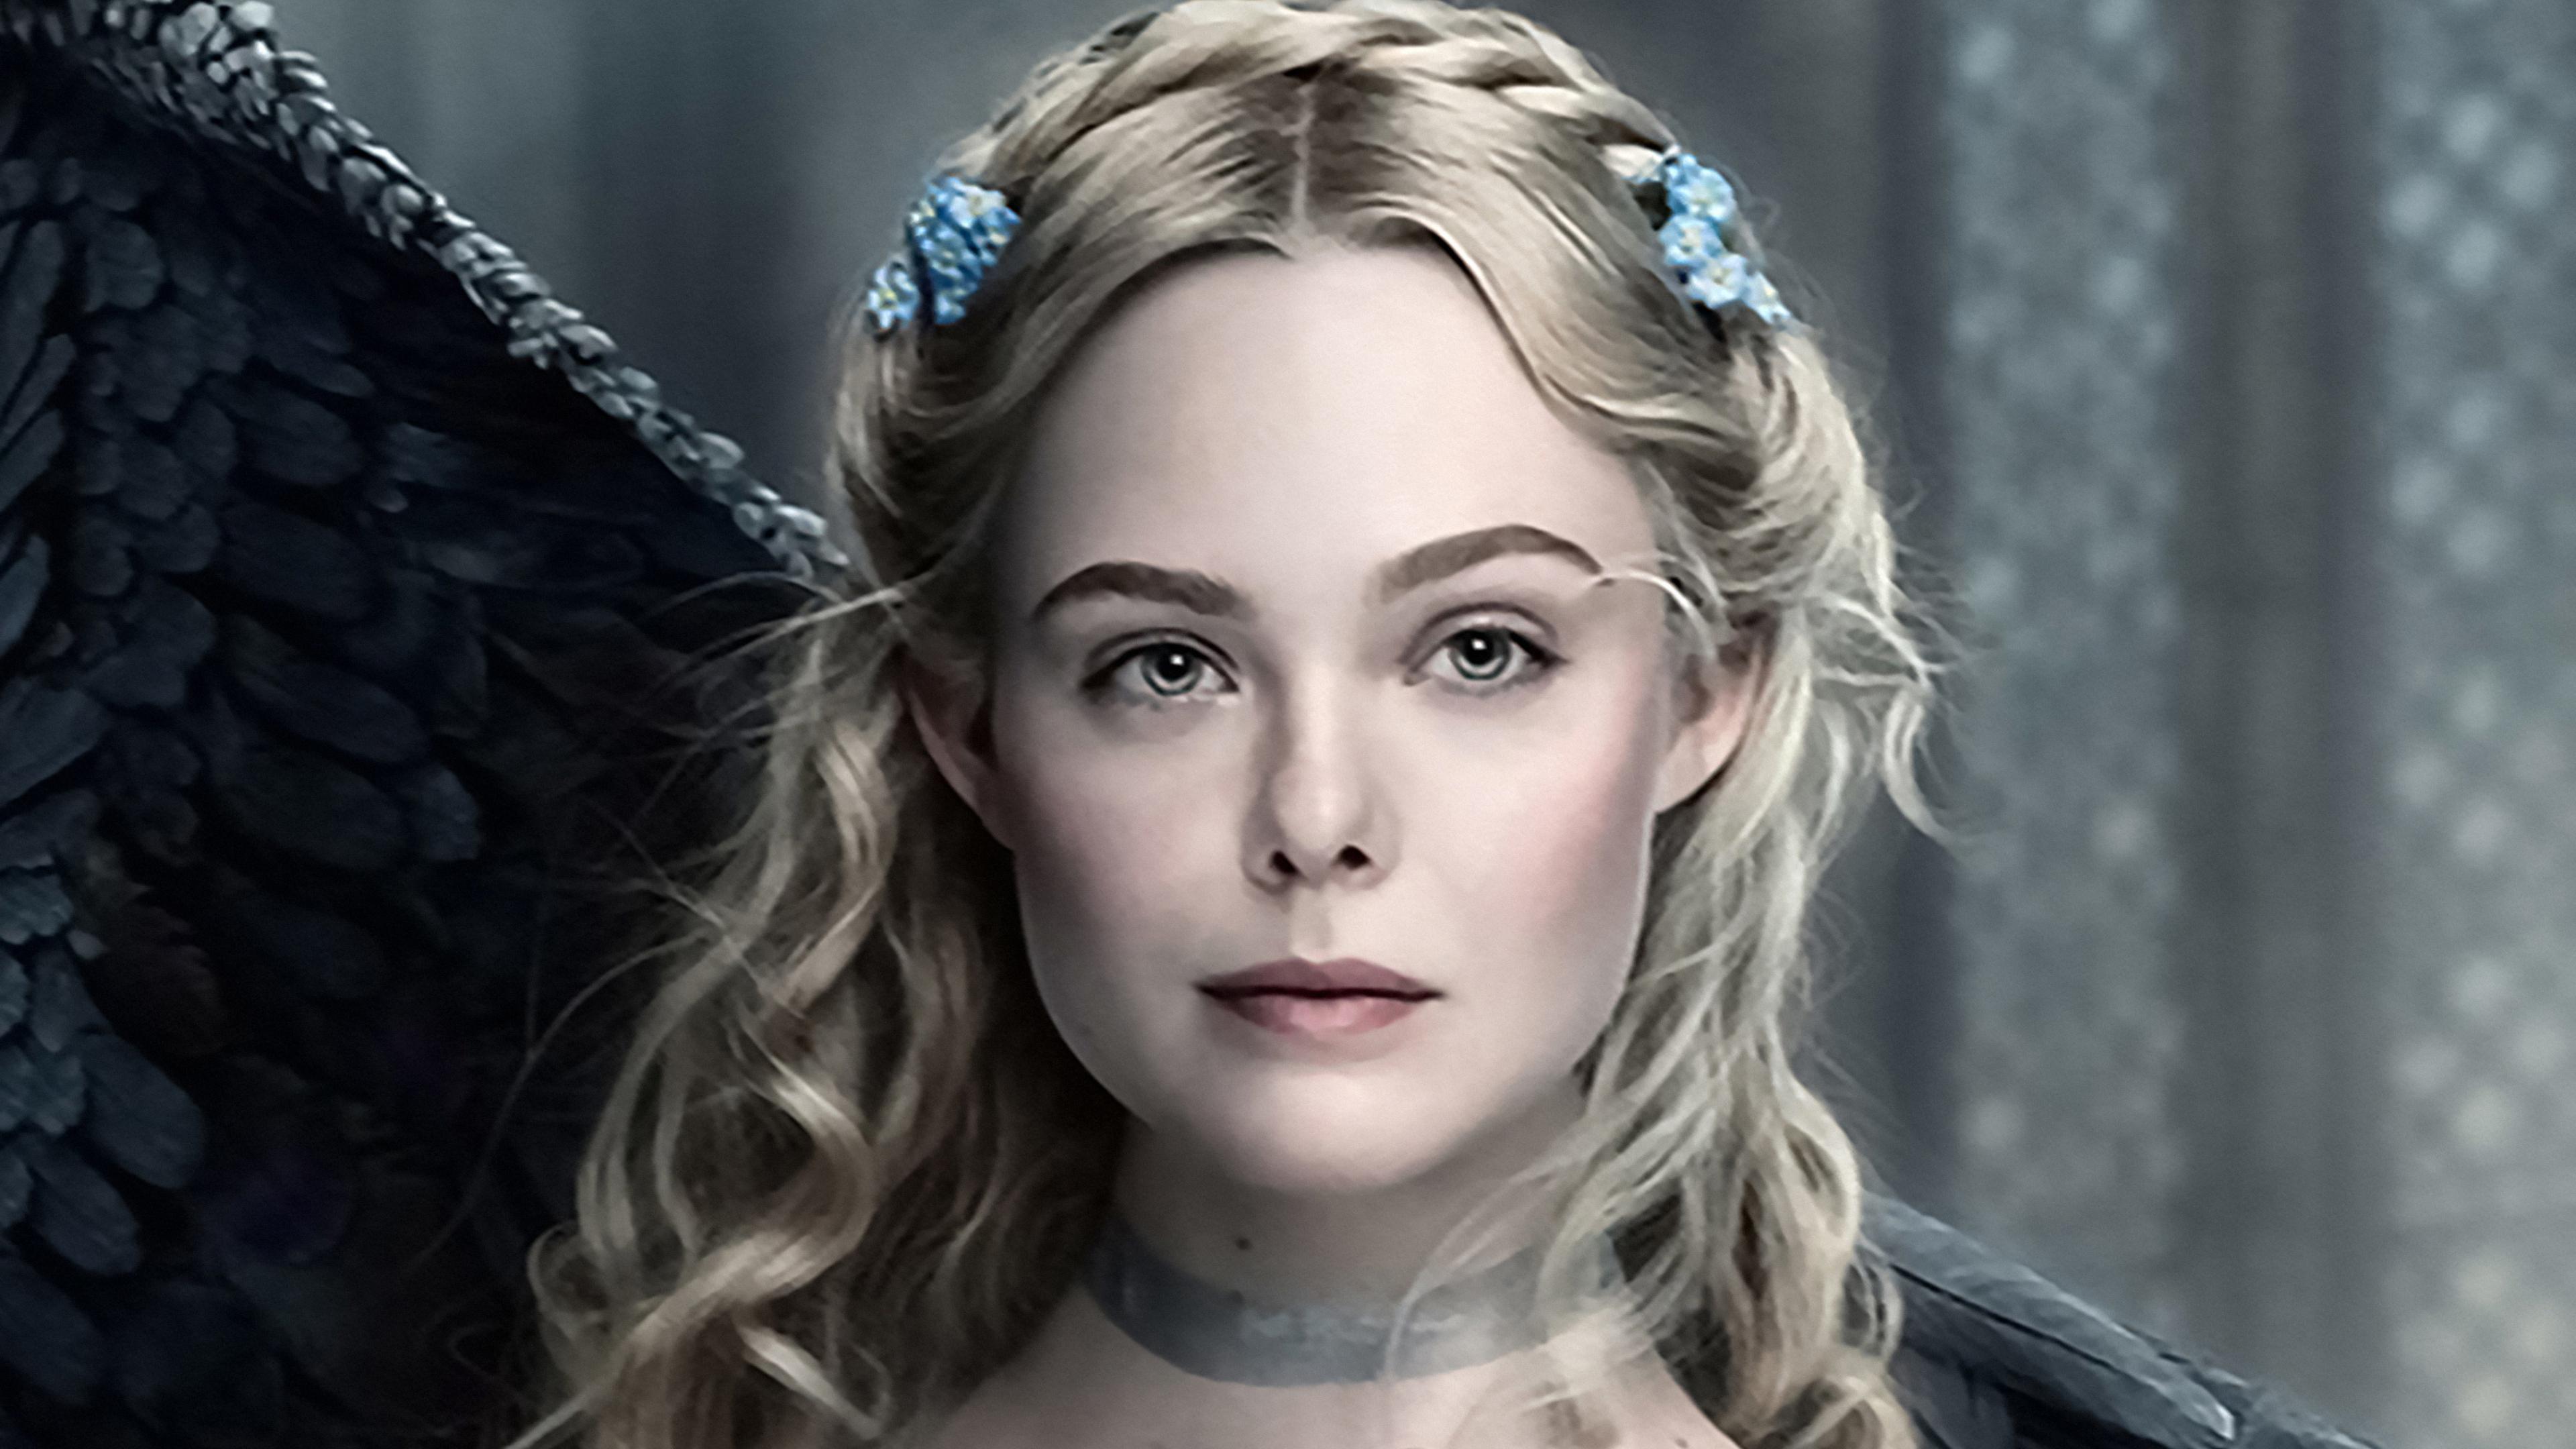 3840x2160 Elle Fanning In Maleficent 2 As Princess Aurora 4k